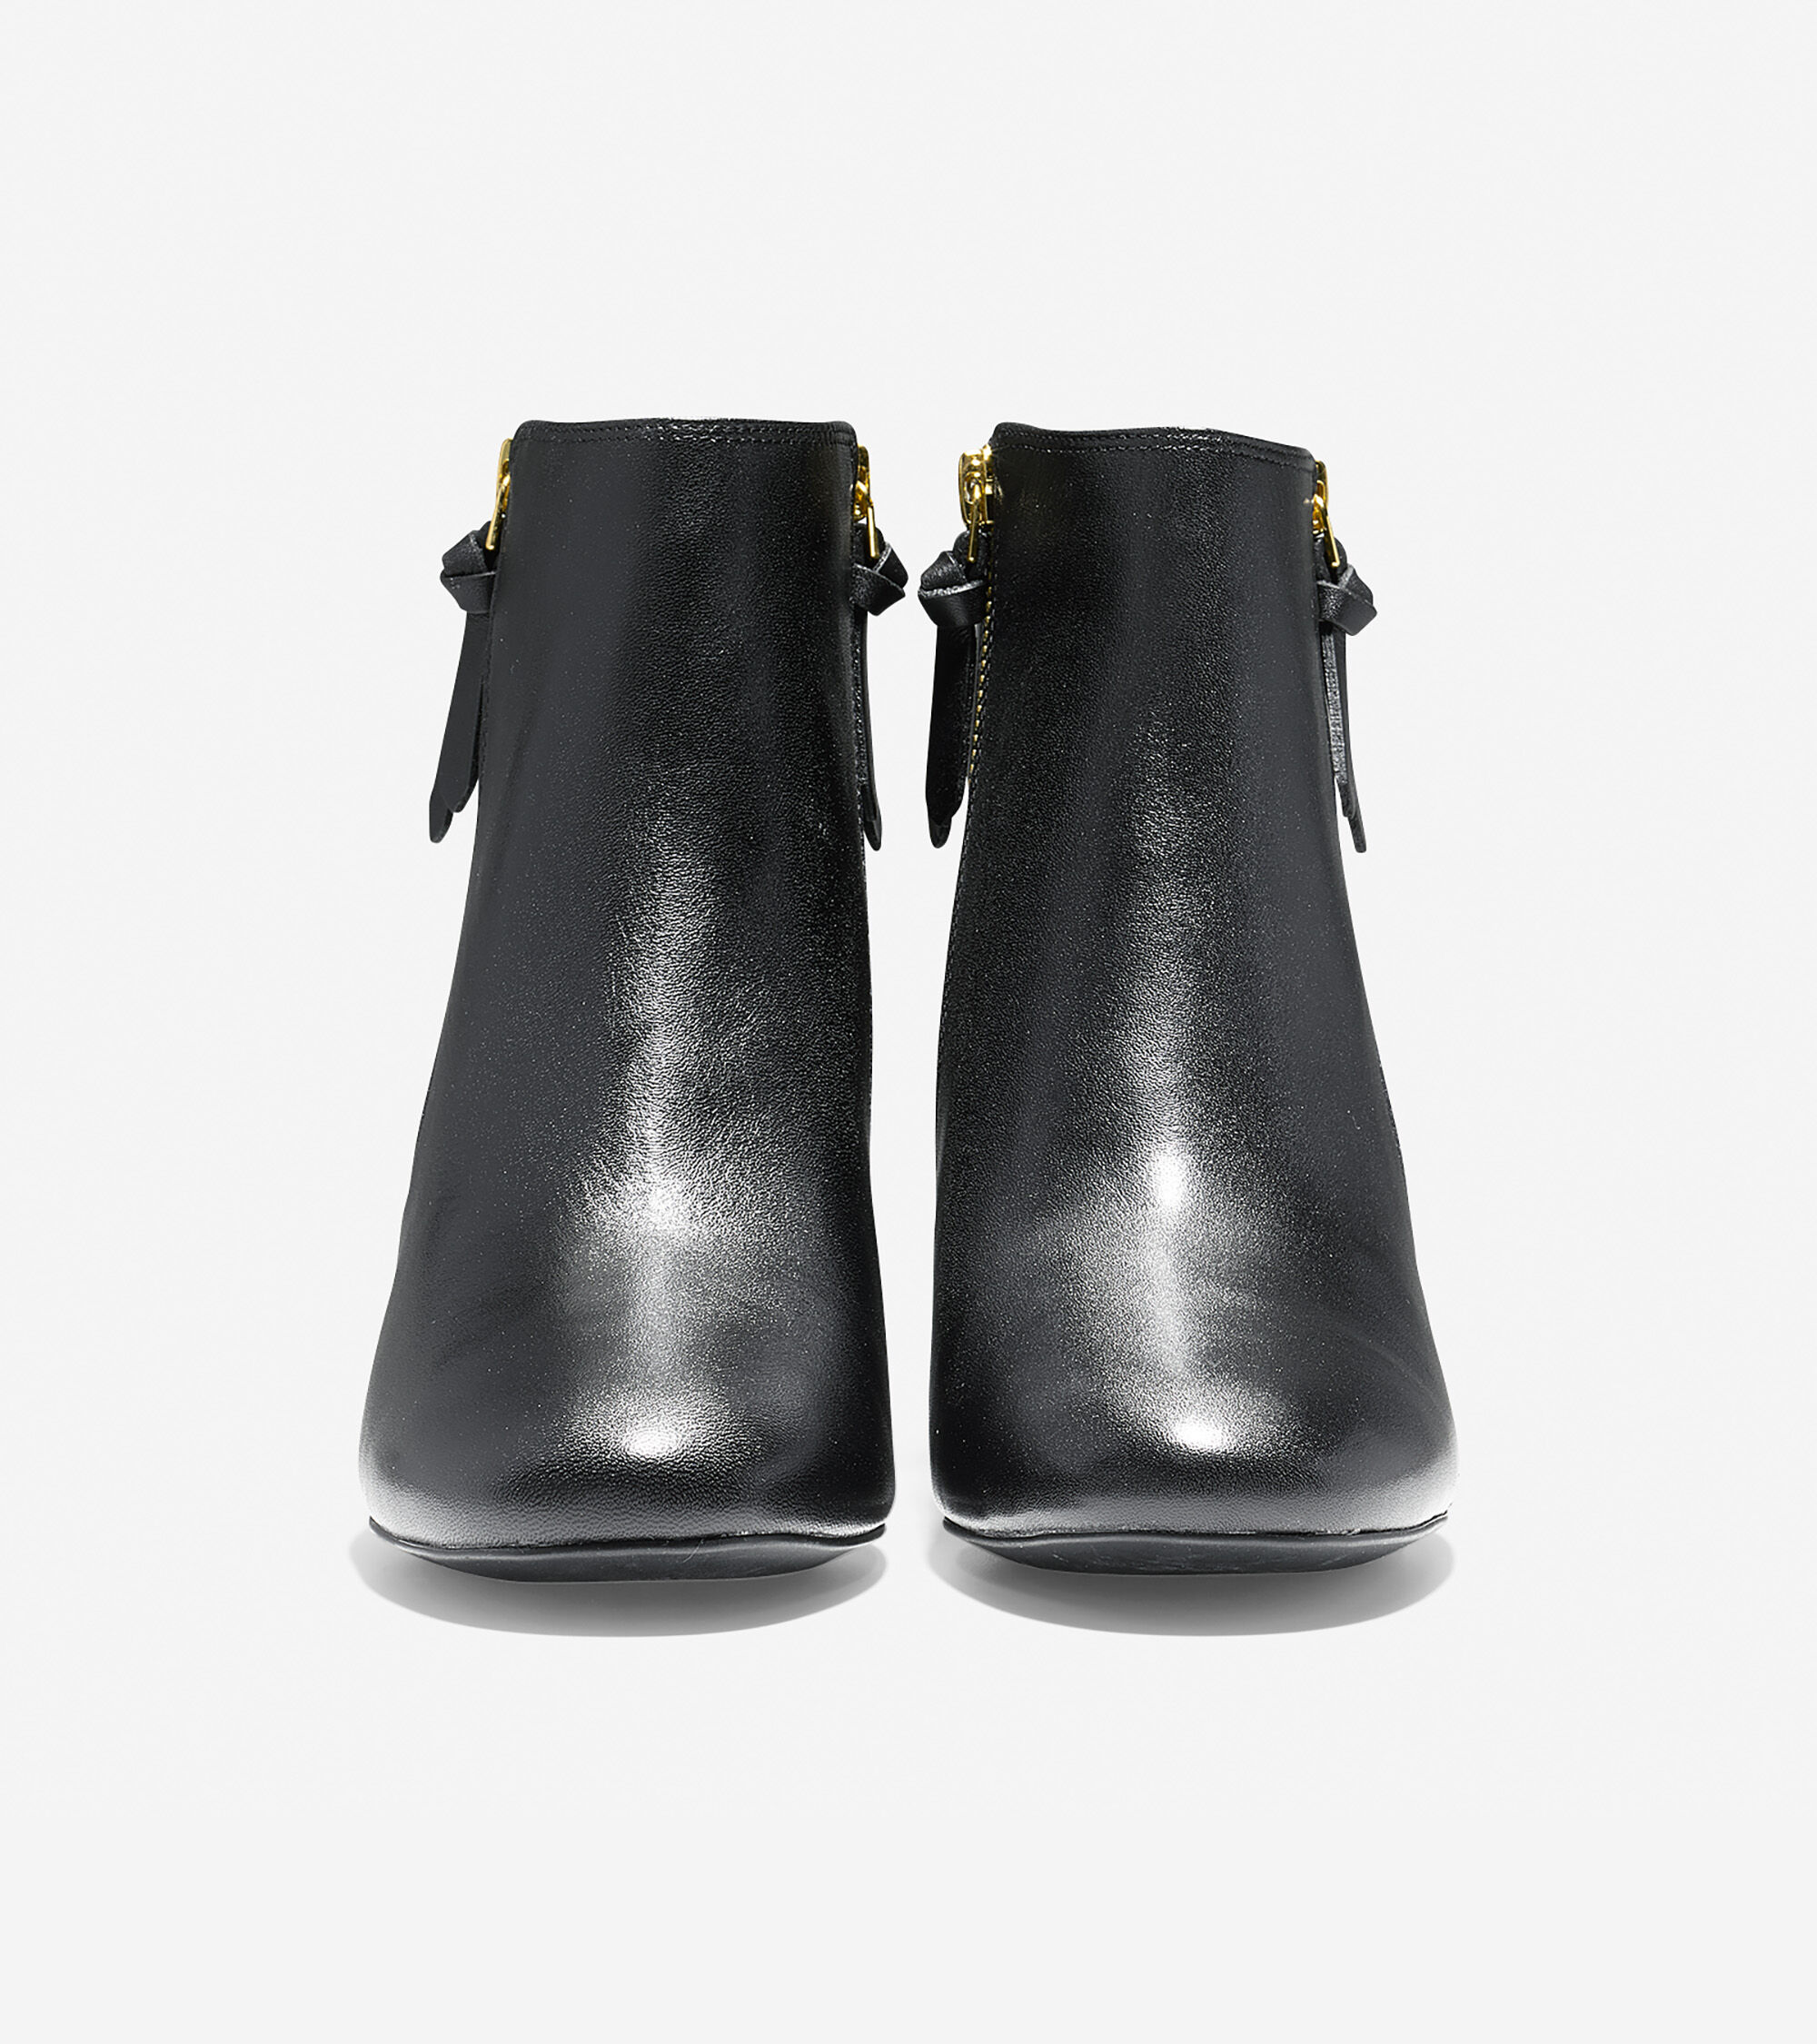 5a8d4feb653 Women s Saylor Grand Booties 60mm in Black